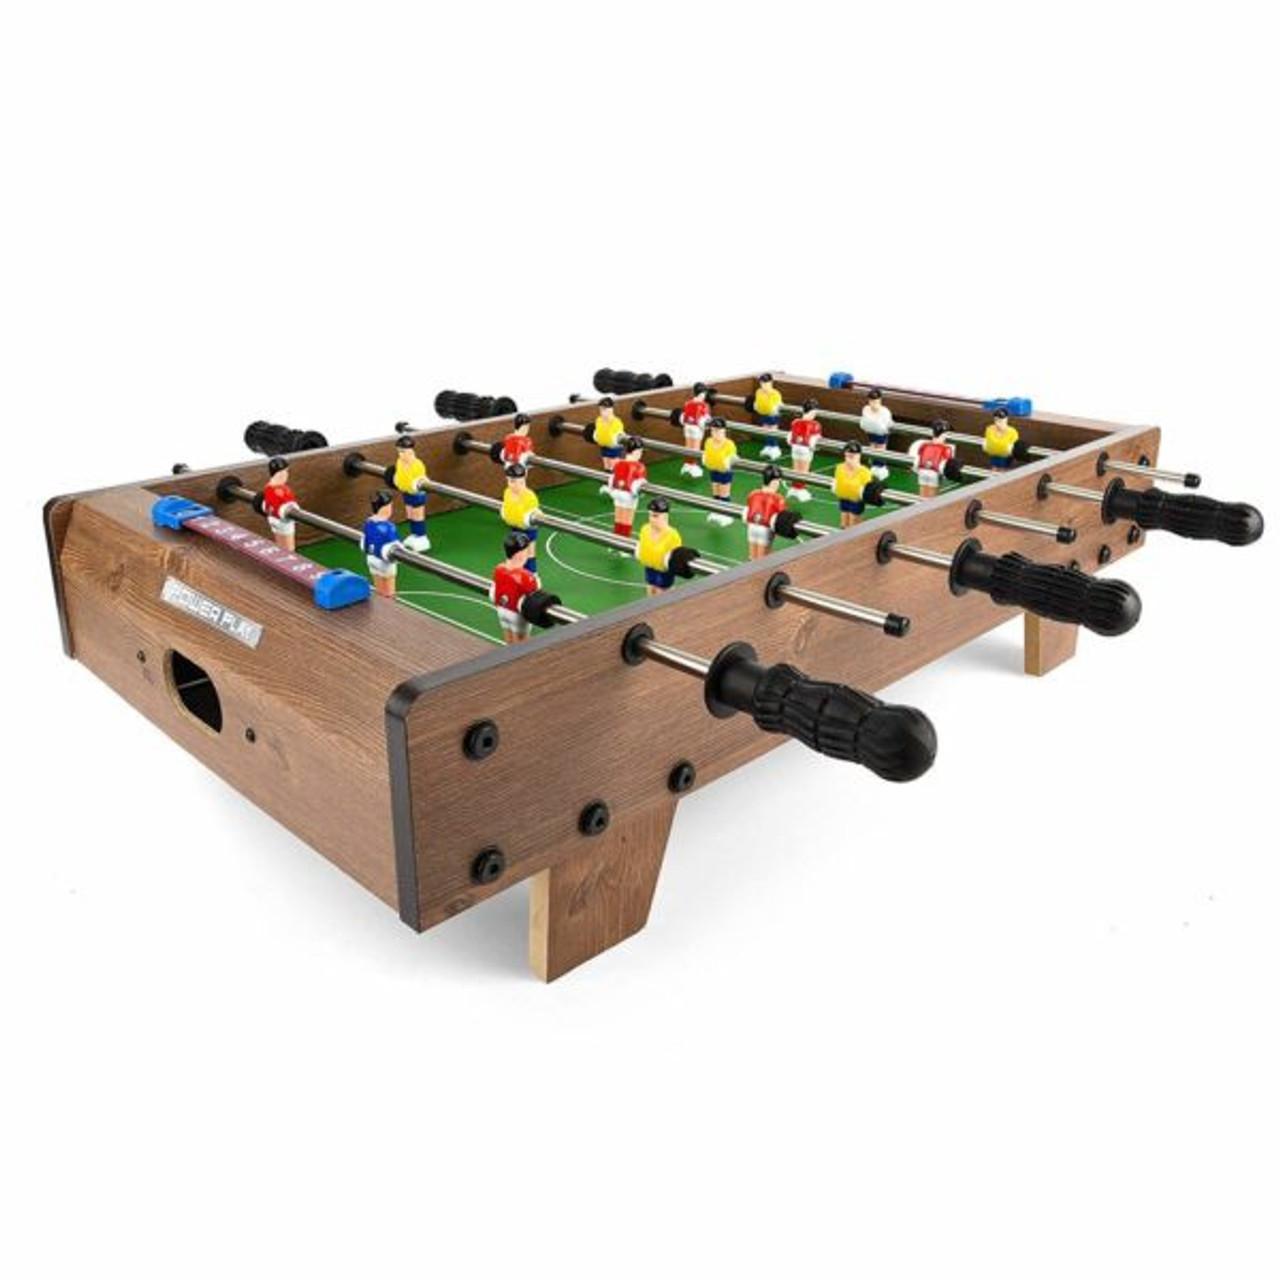 POWER PLAY 27 TABLE TOP FOOTBALL